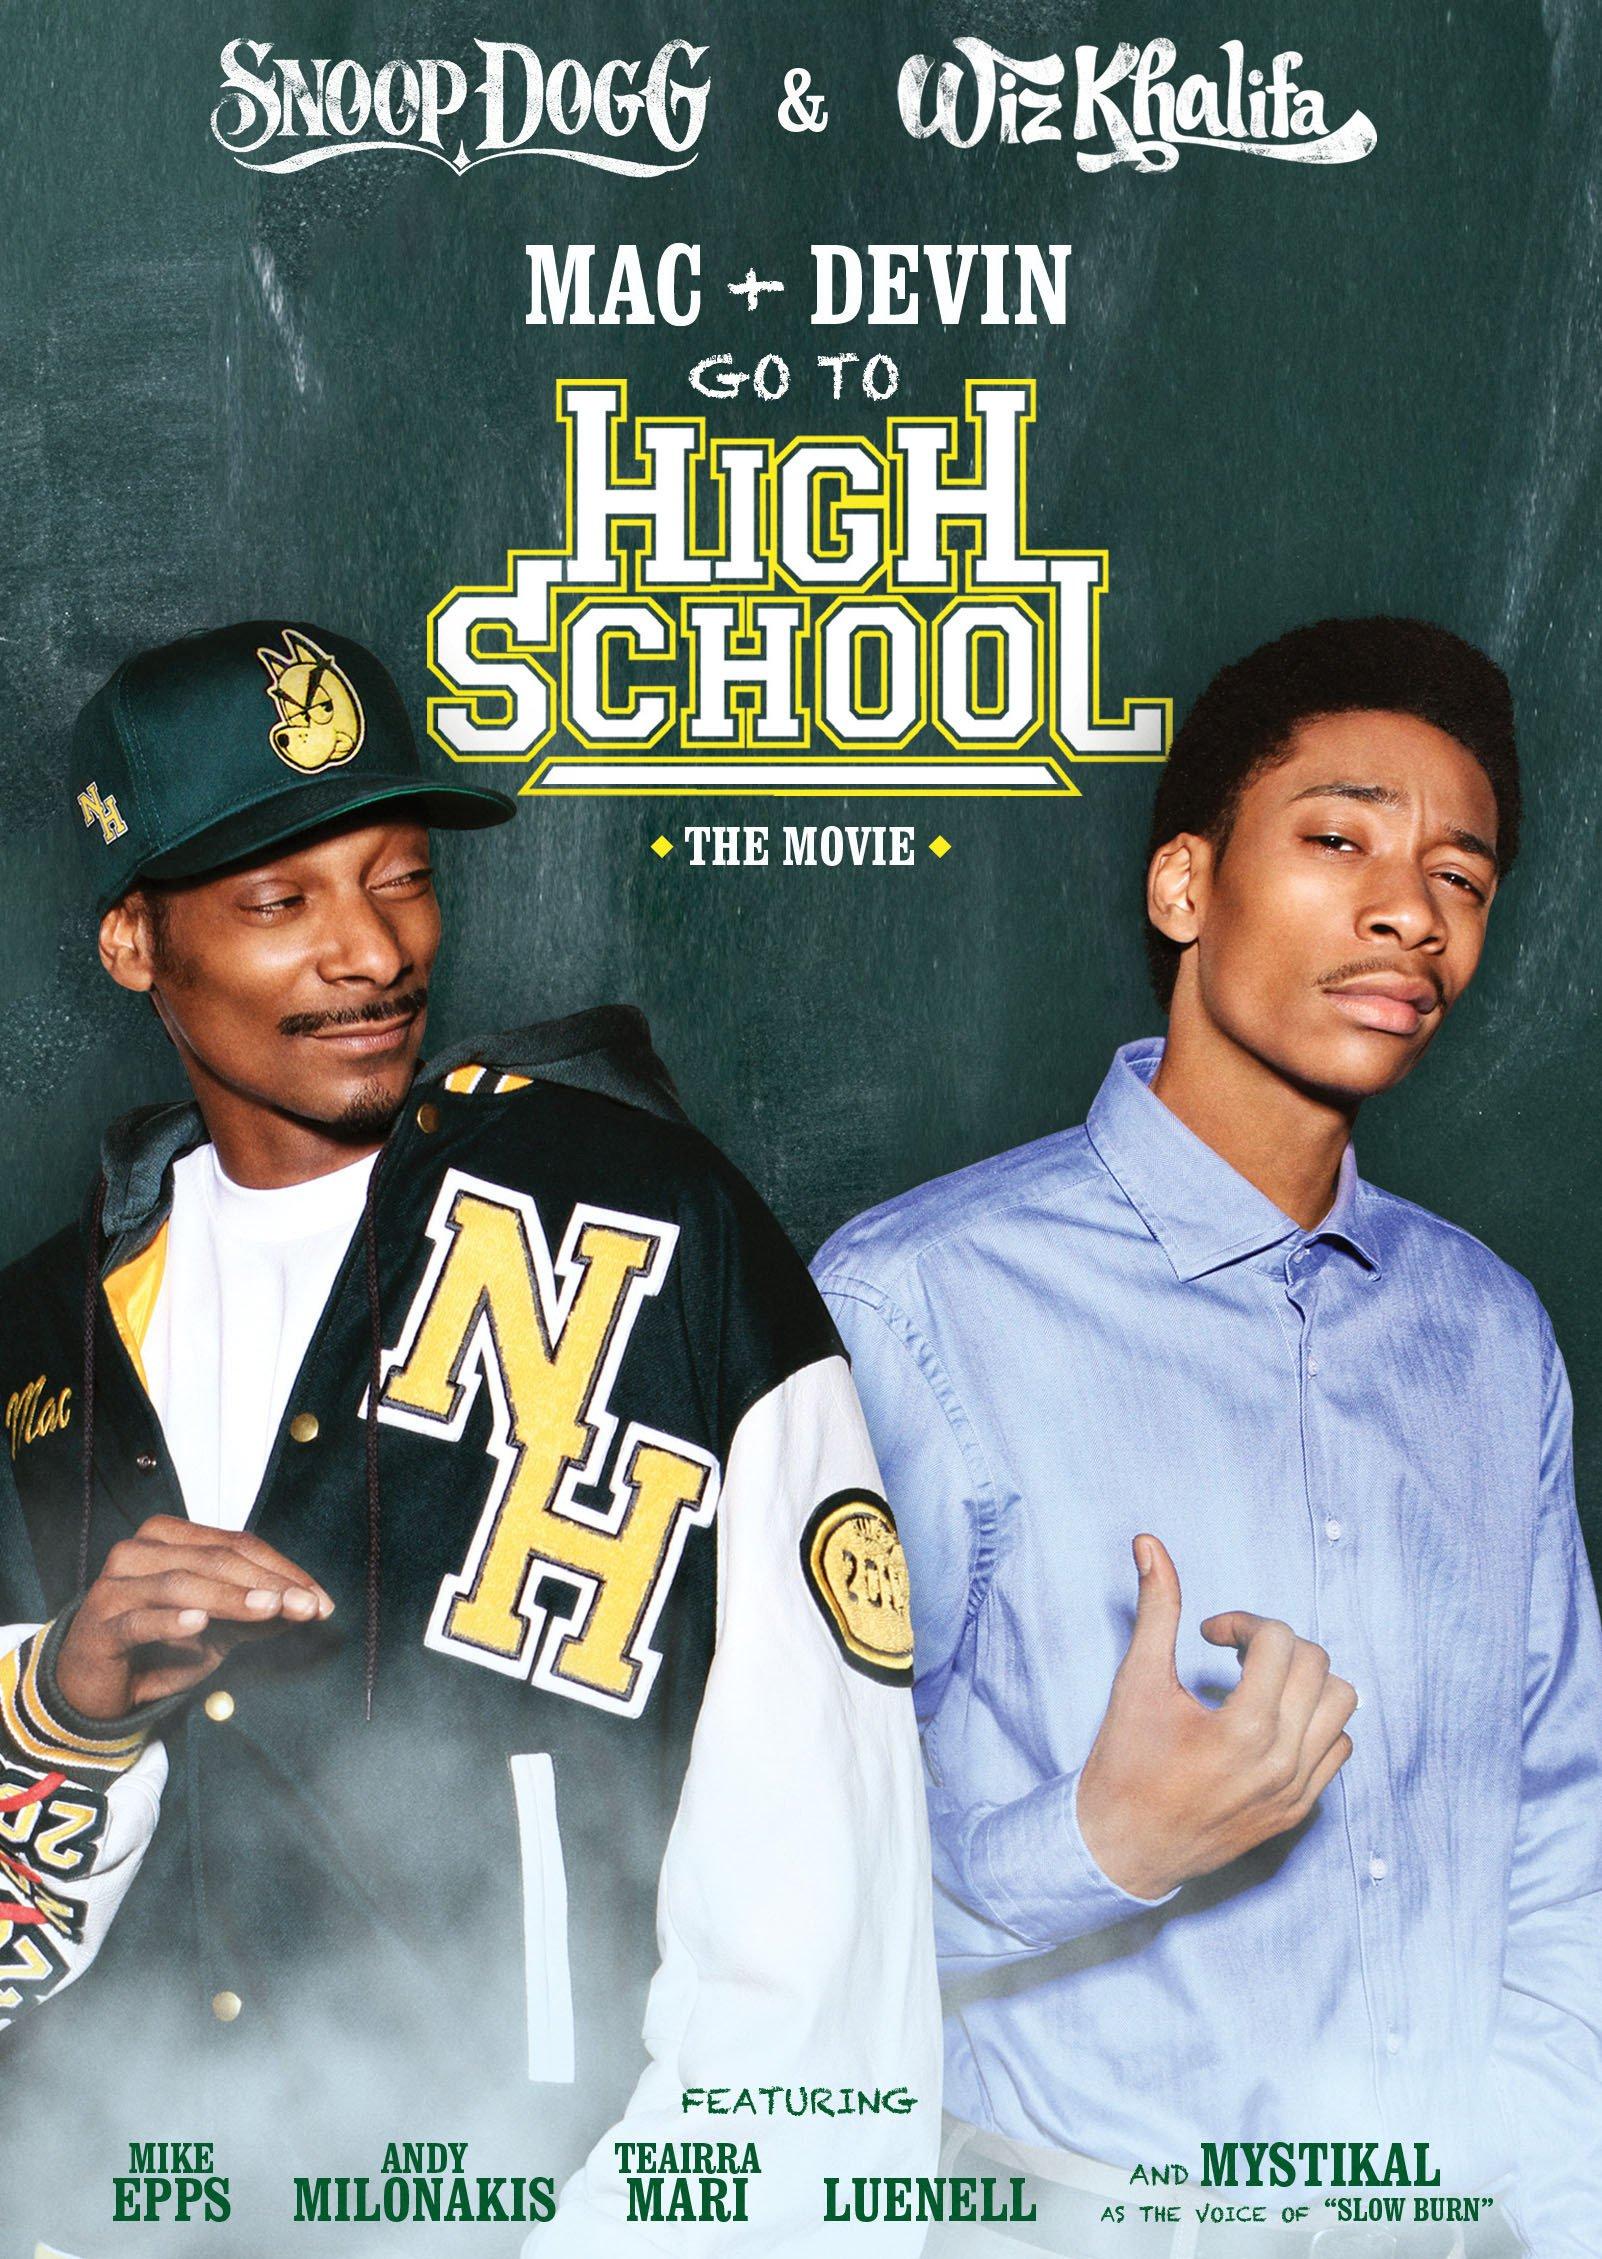 Film Snoop Dogg Wiz Khalifa